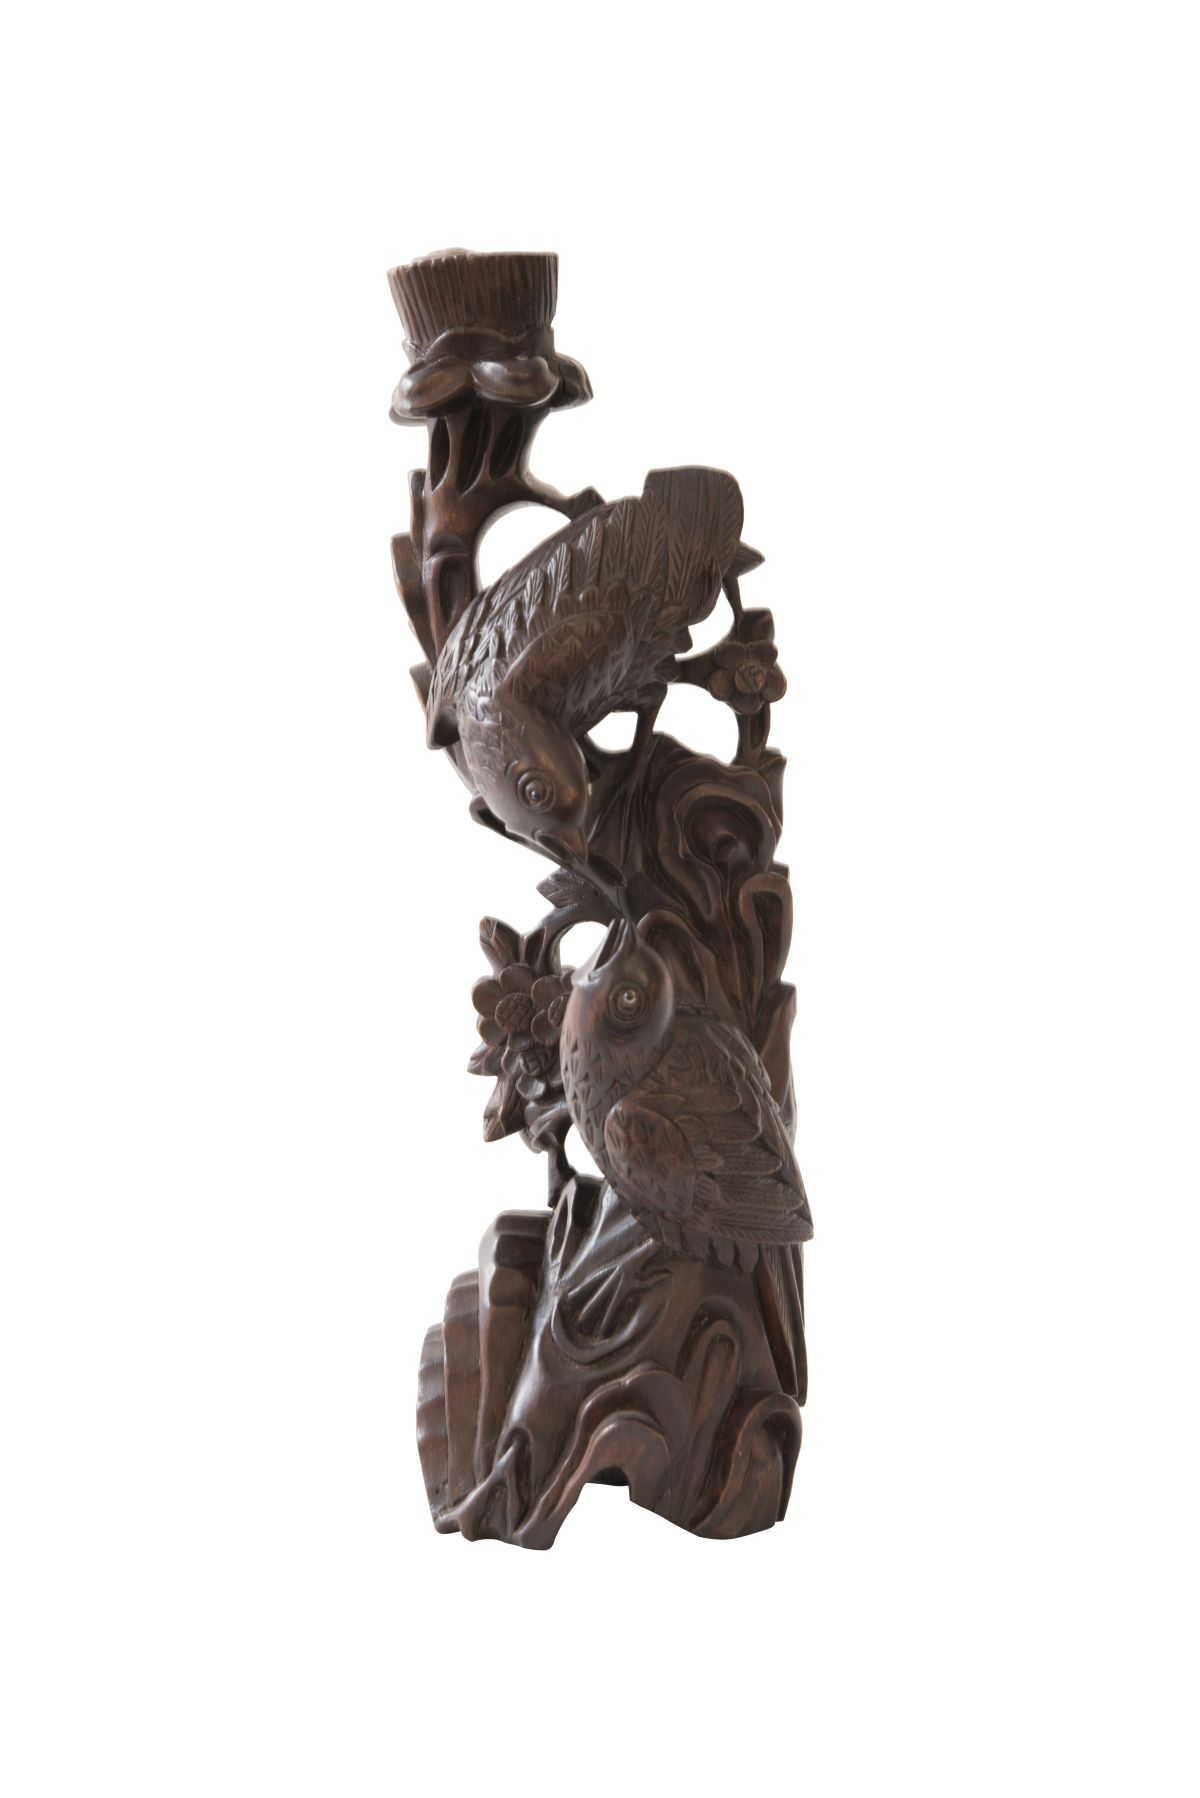 #97 Wooden candlesticks | Holzkerzenständer Image